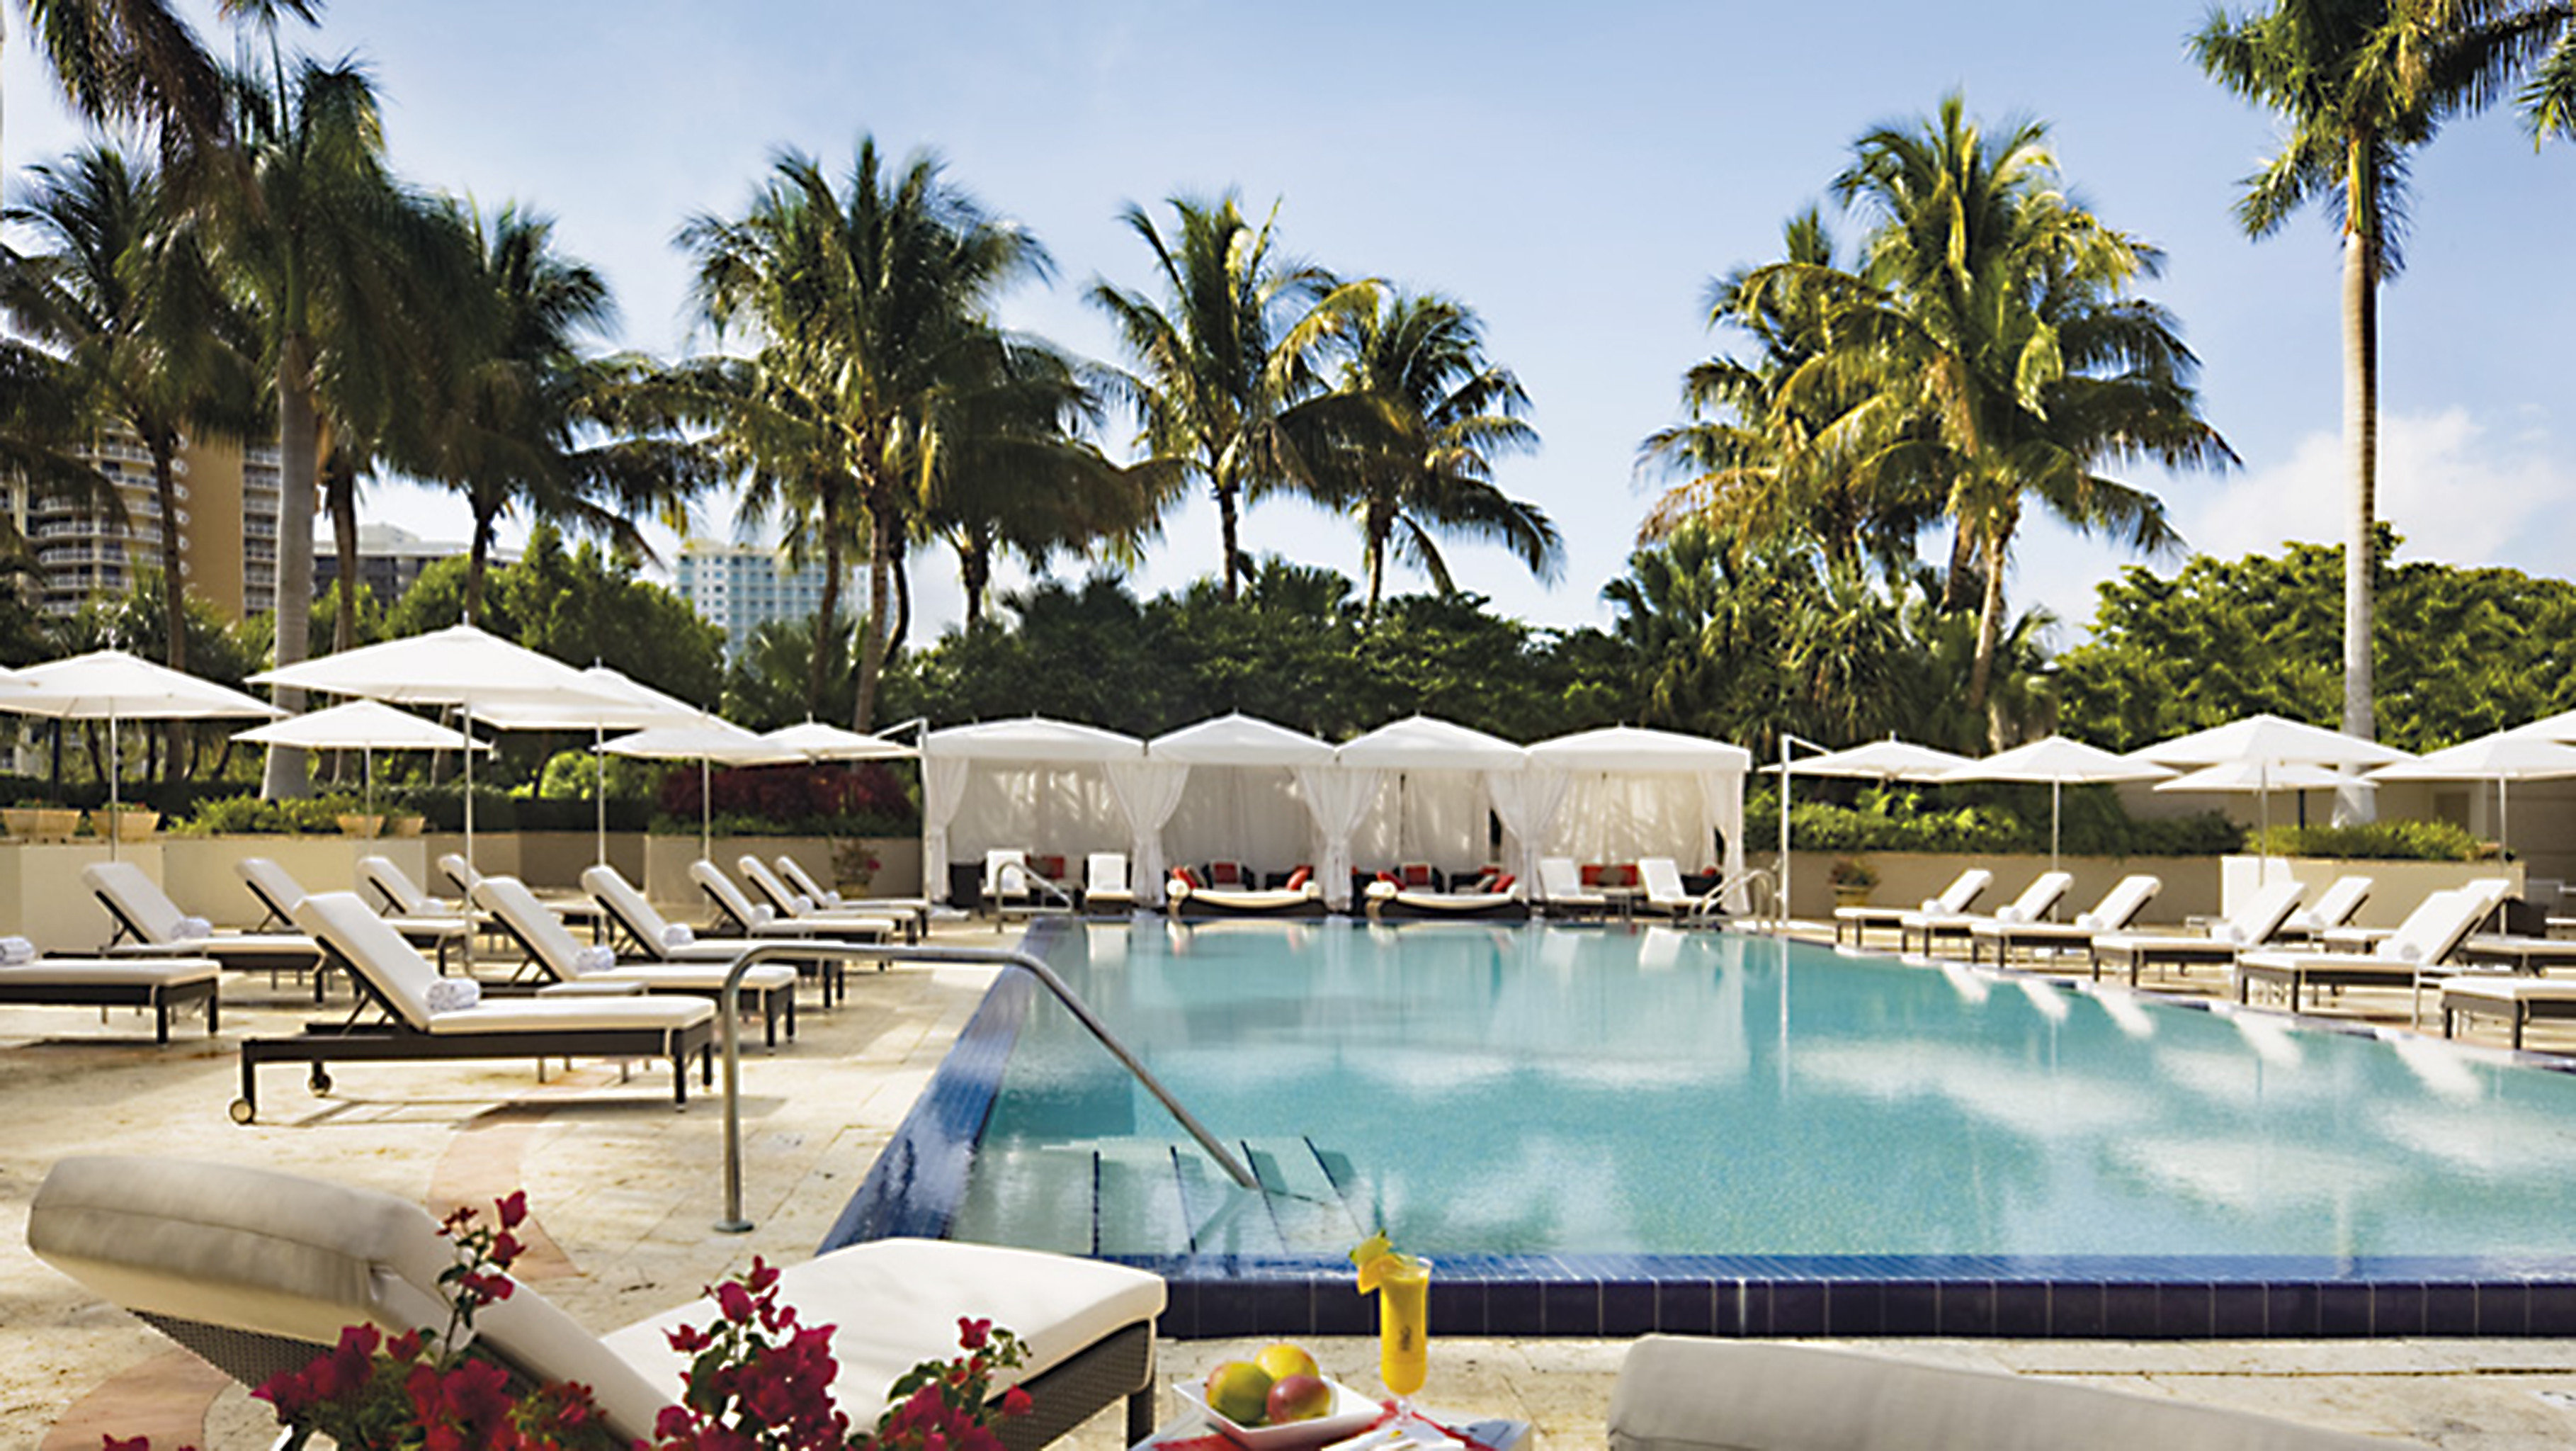 tree sky palm leisure swimming pool Resort Pool Villa backyard lined shore